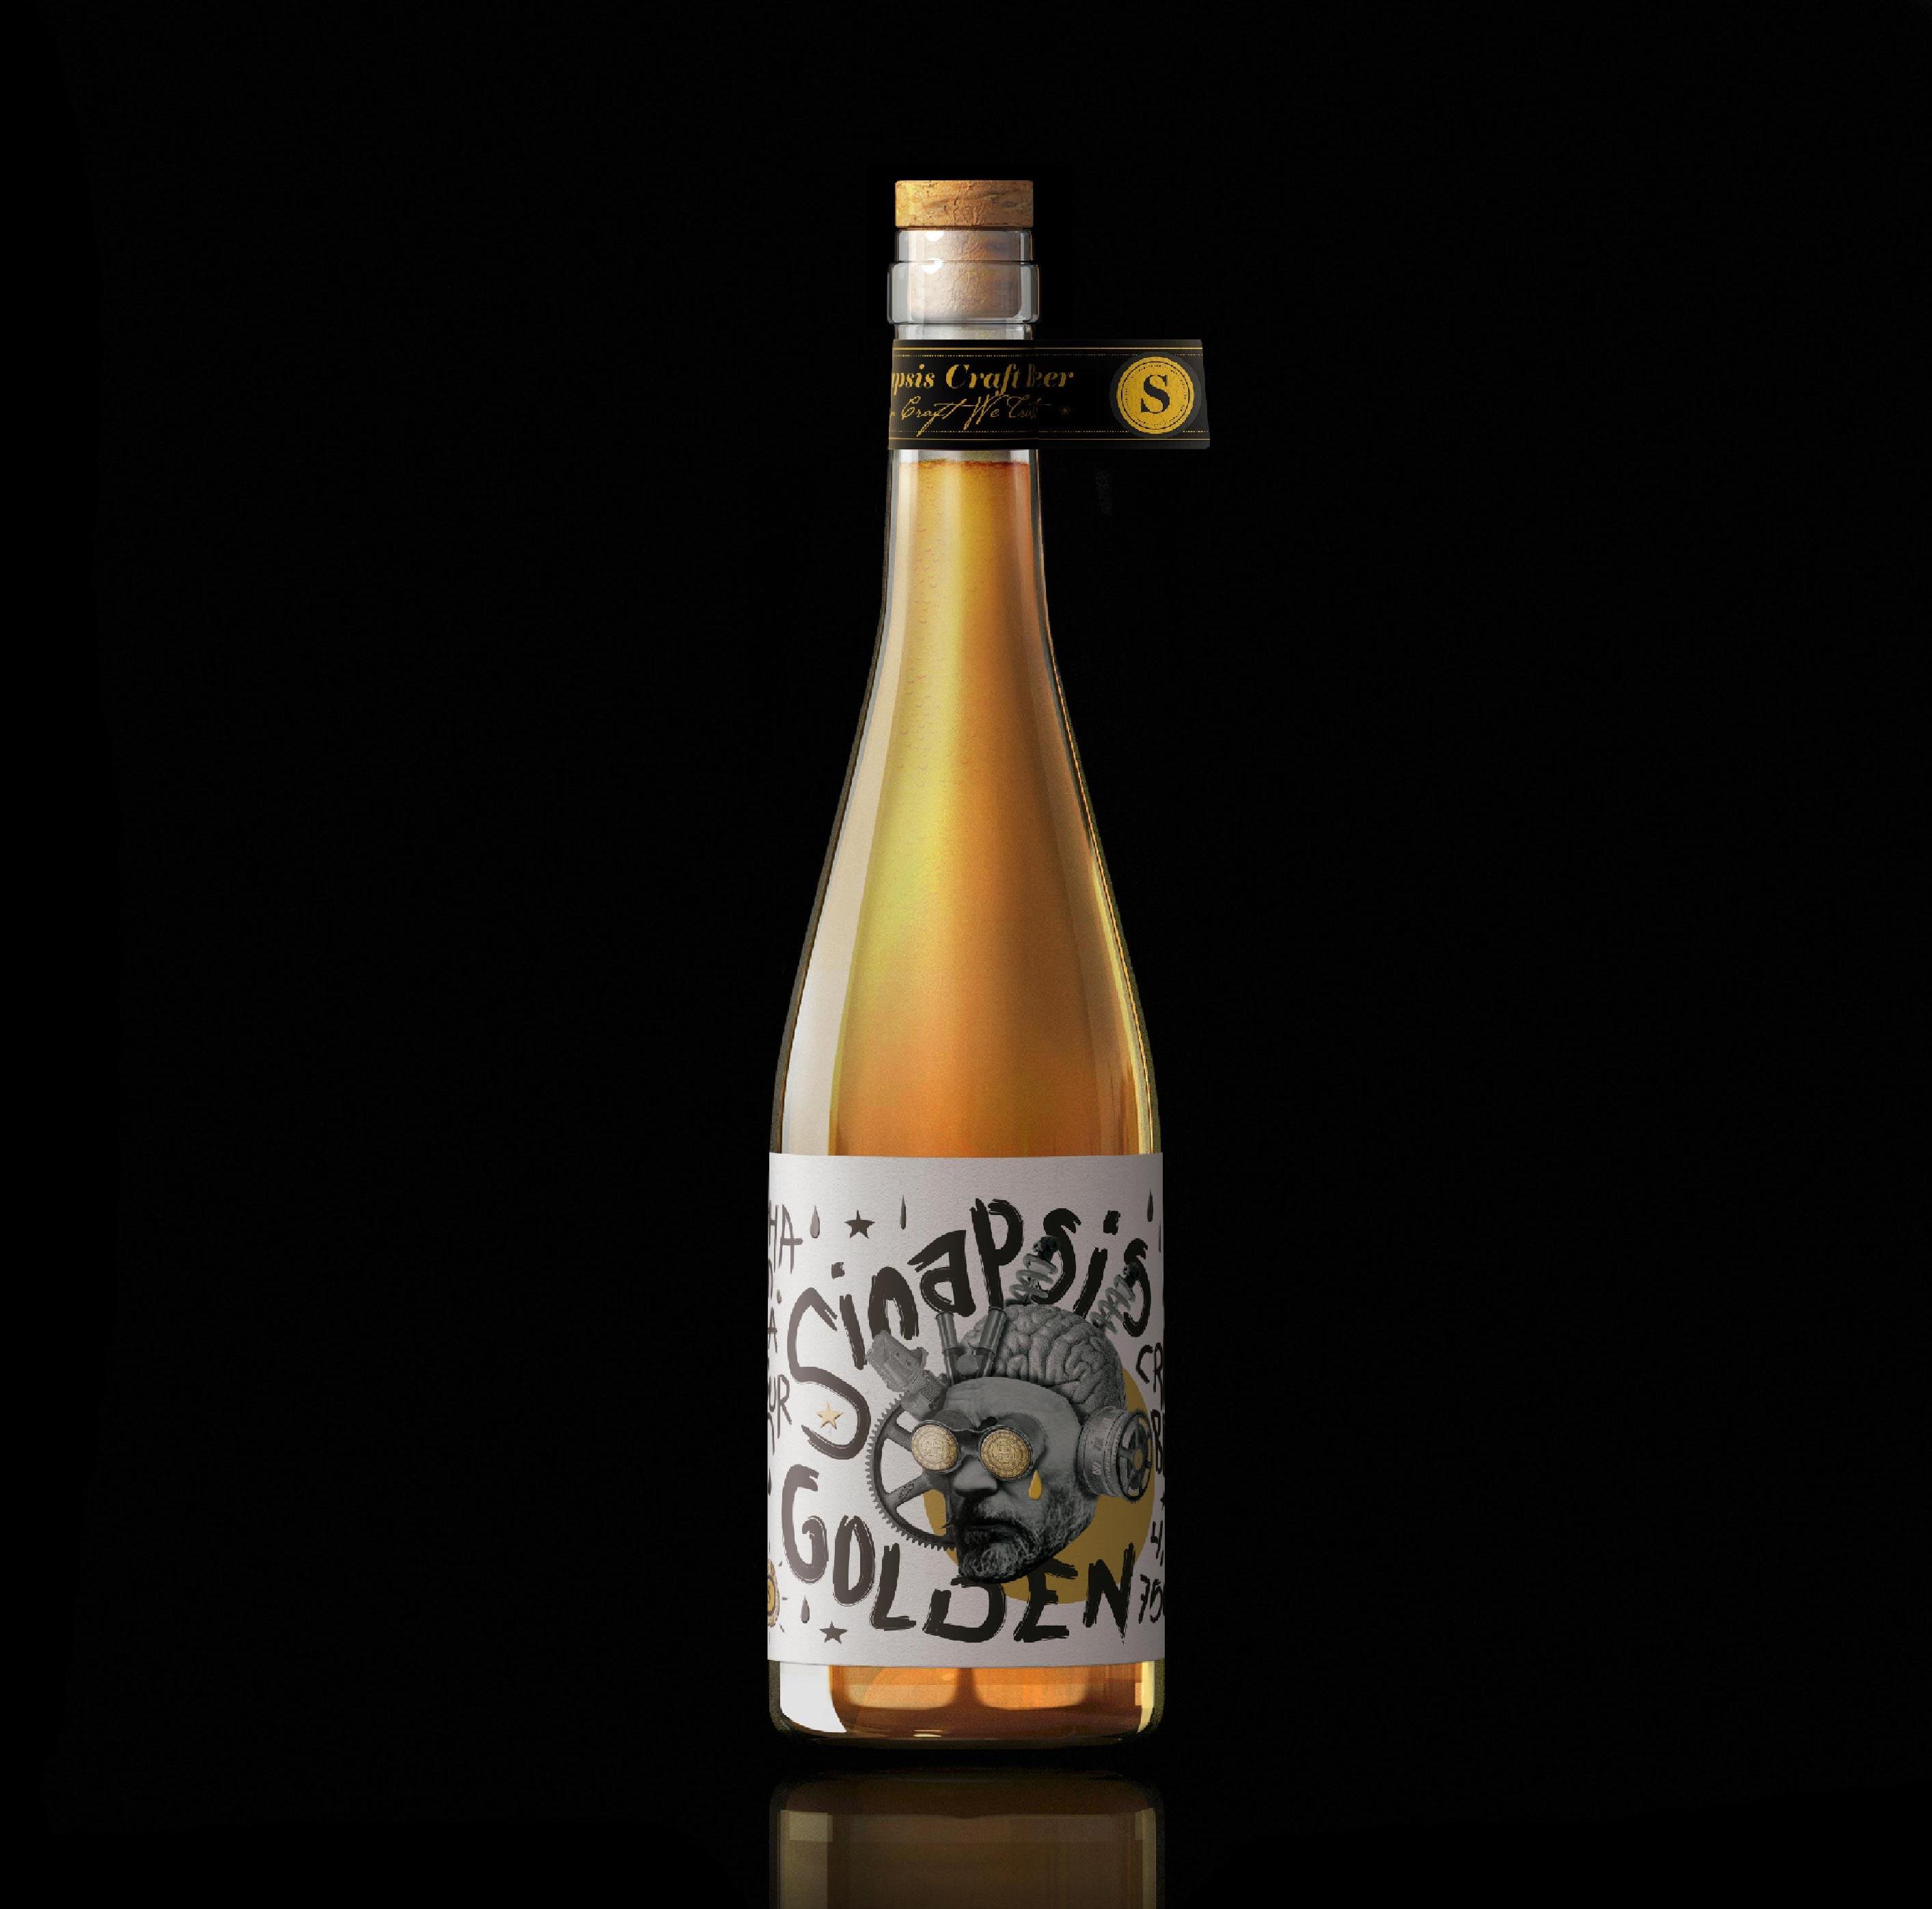 Sinapsis Craft Beer By Vantablack Creative Studio